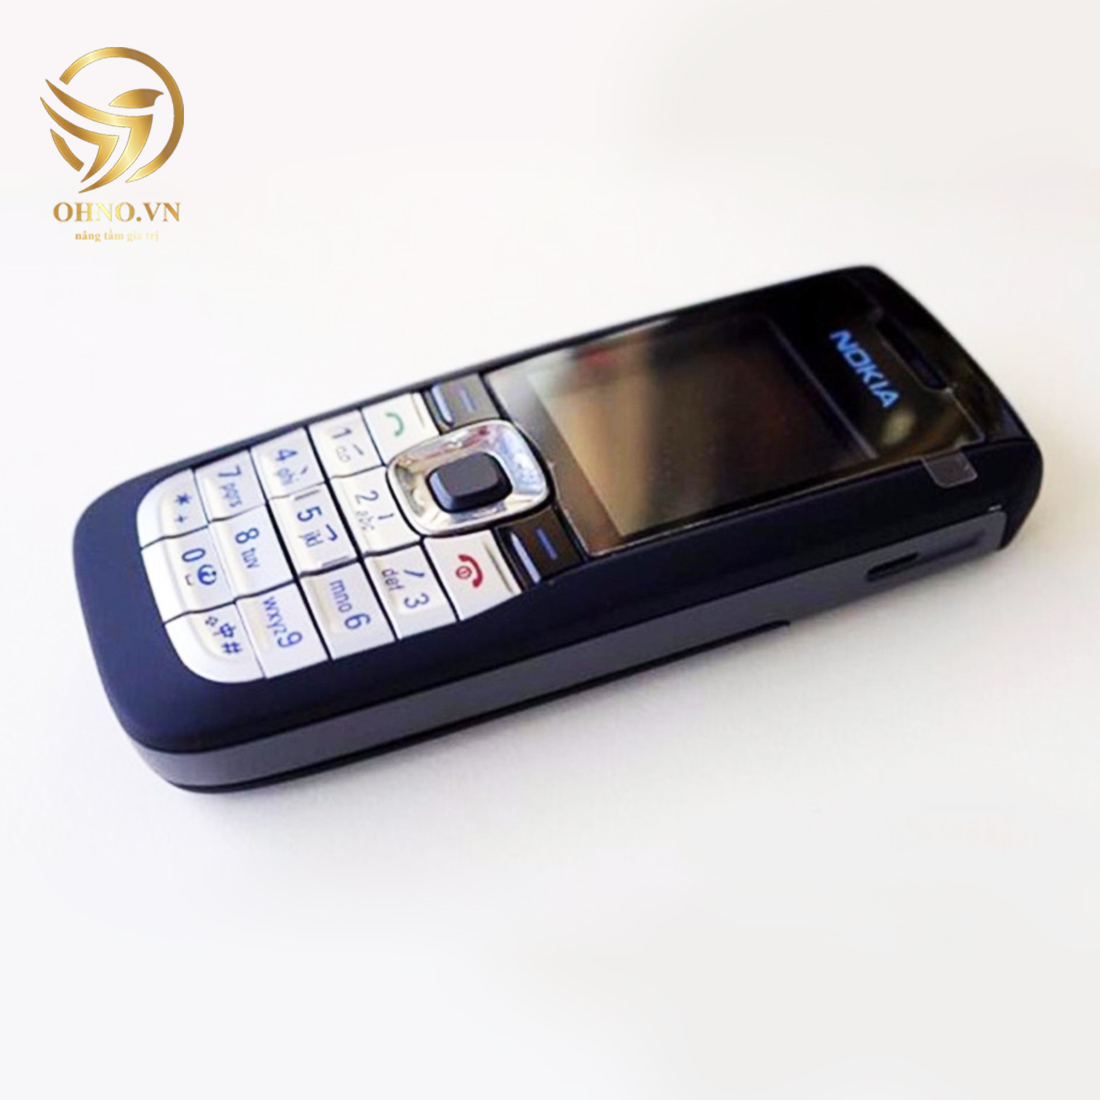 điện Thoại Nokia Cổ 2610